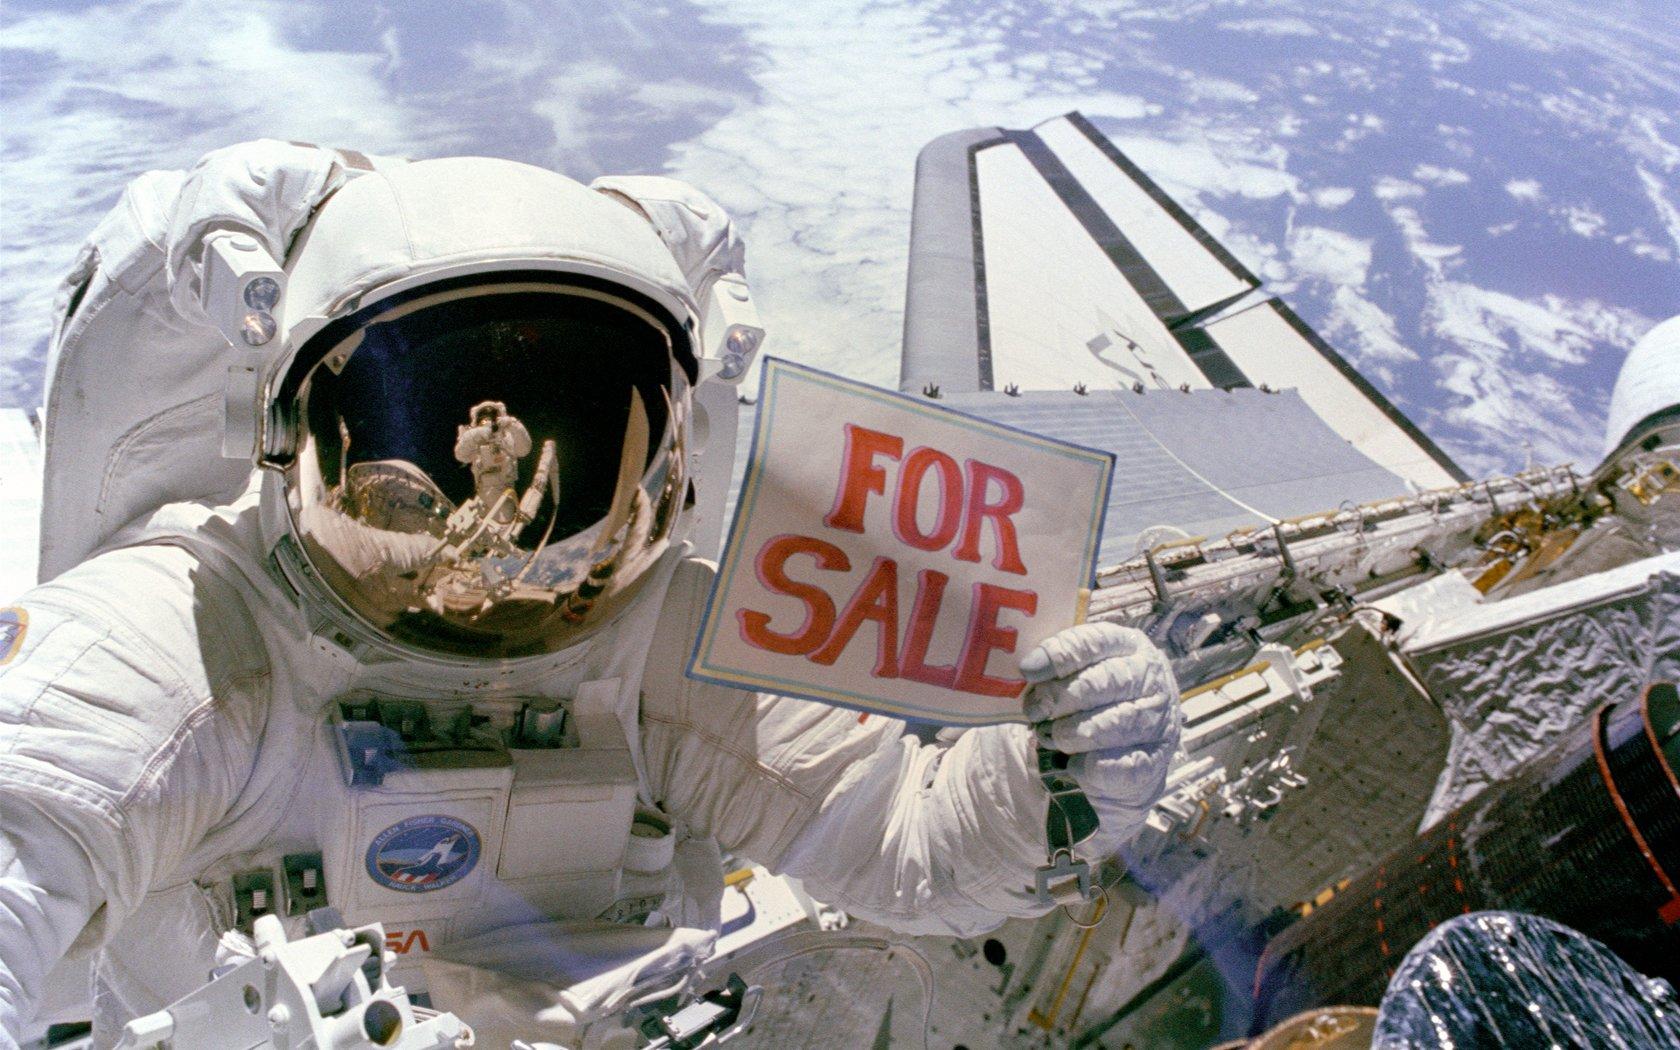 astronauts space walk photos - photo #31